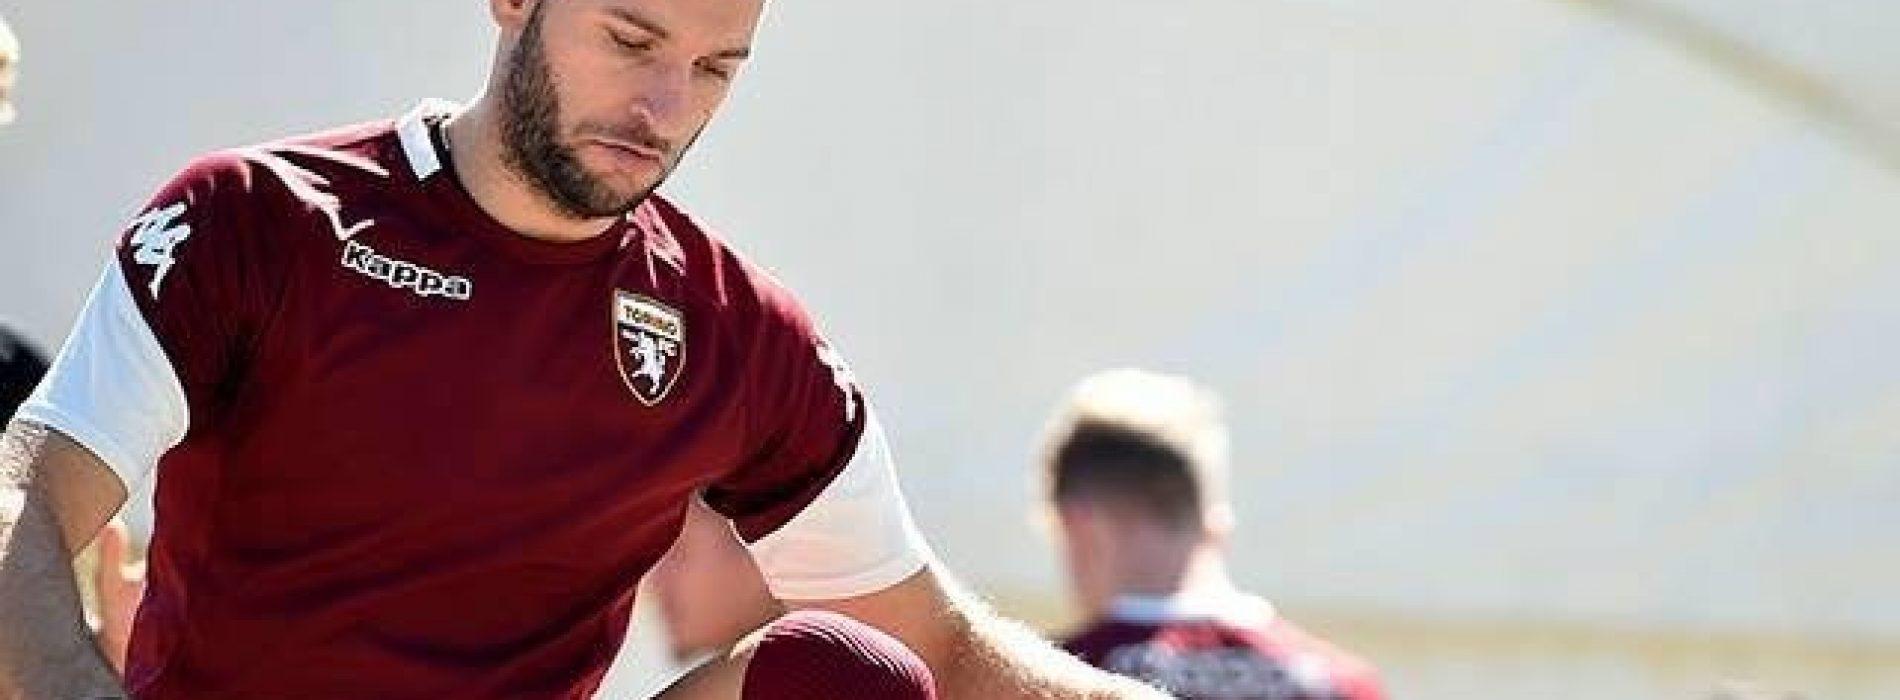 Gaston Silva: l'ex Torino vicino al Benfica – ESCLUSIVA EC